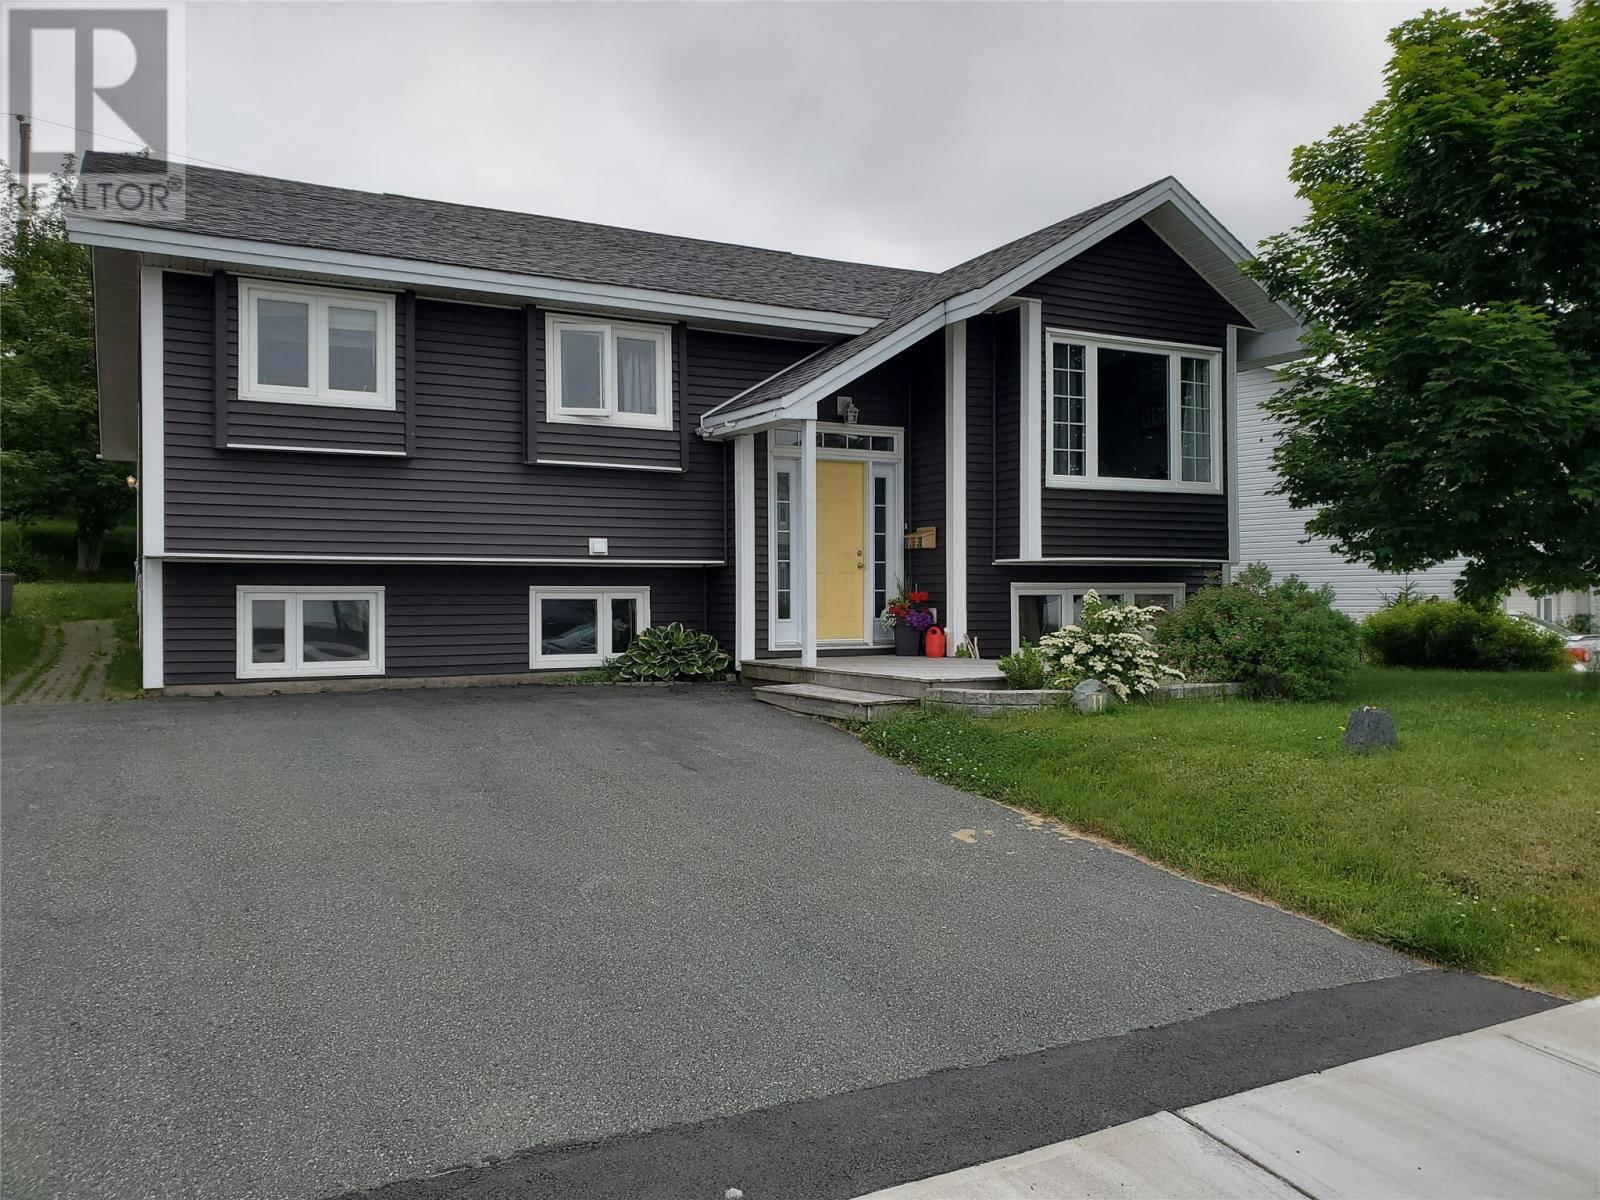 House for sale at 11 Creston Pl St.john's Newfoundland - MLS: 1200152